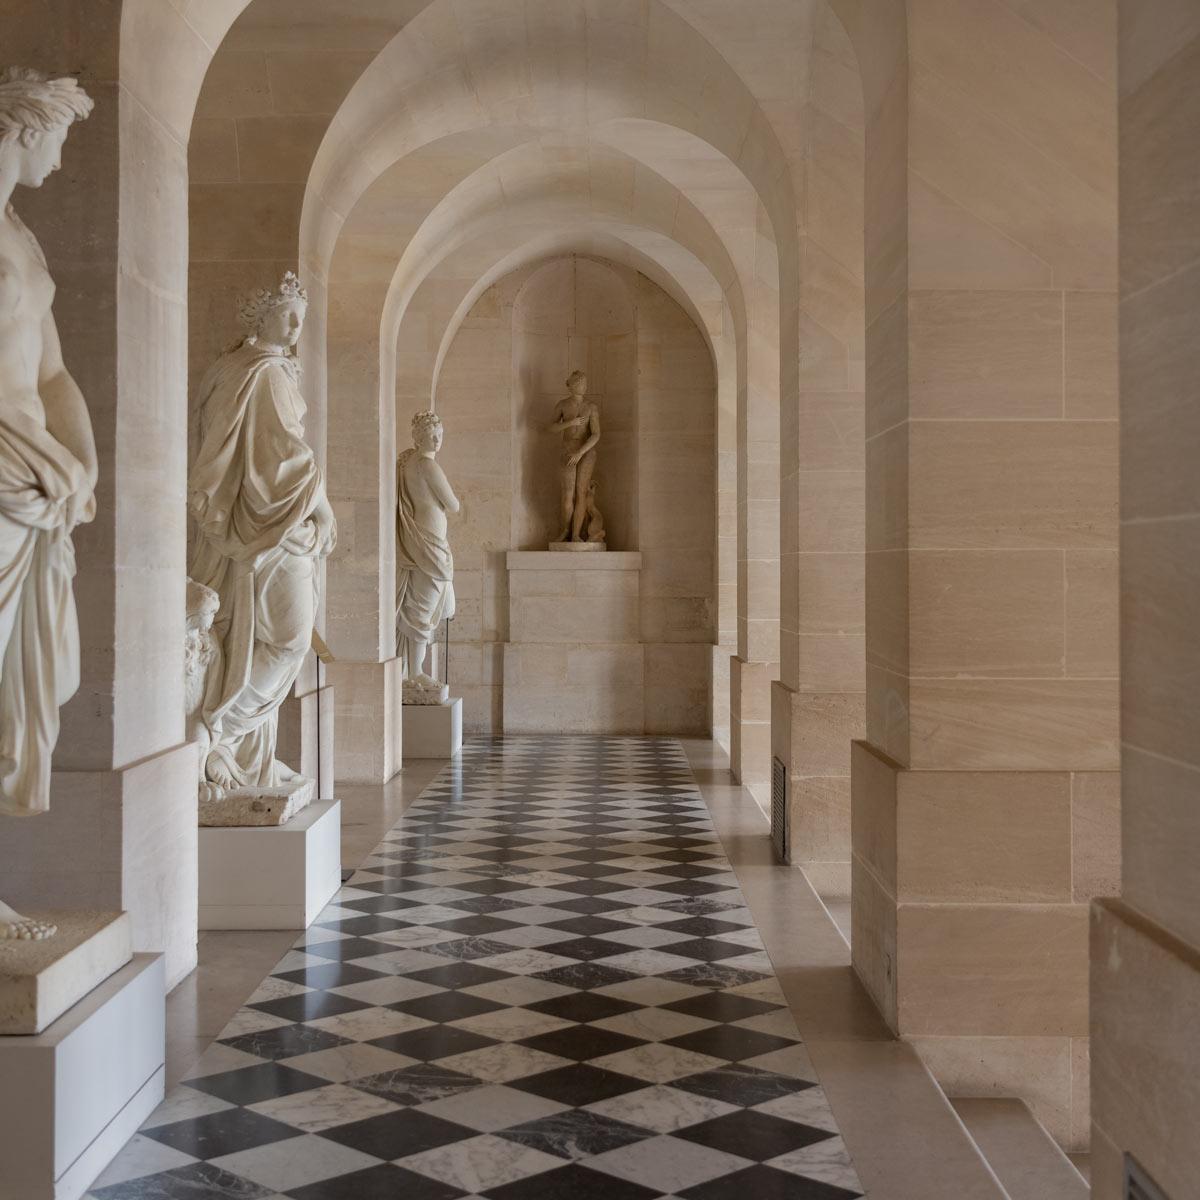 Interior Walkway into Courtyard of Chateau de Versailles